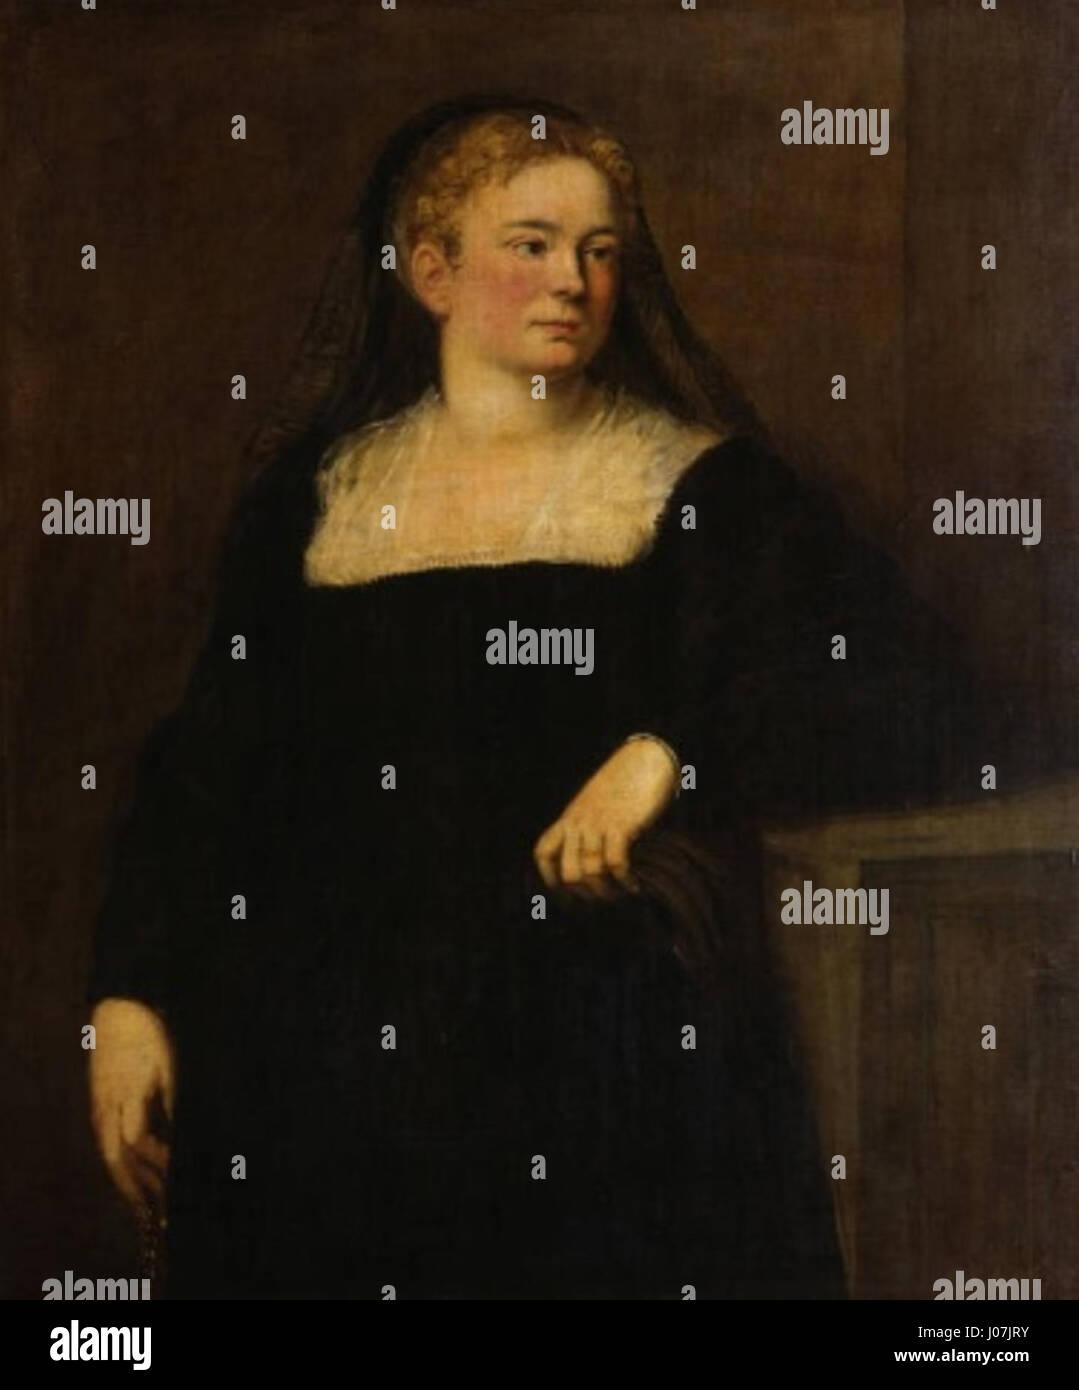 Dama de luto (Gemäldegalerie de Dresde, c. 1550-1555) - Tintoretto Stock Photo